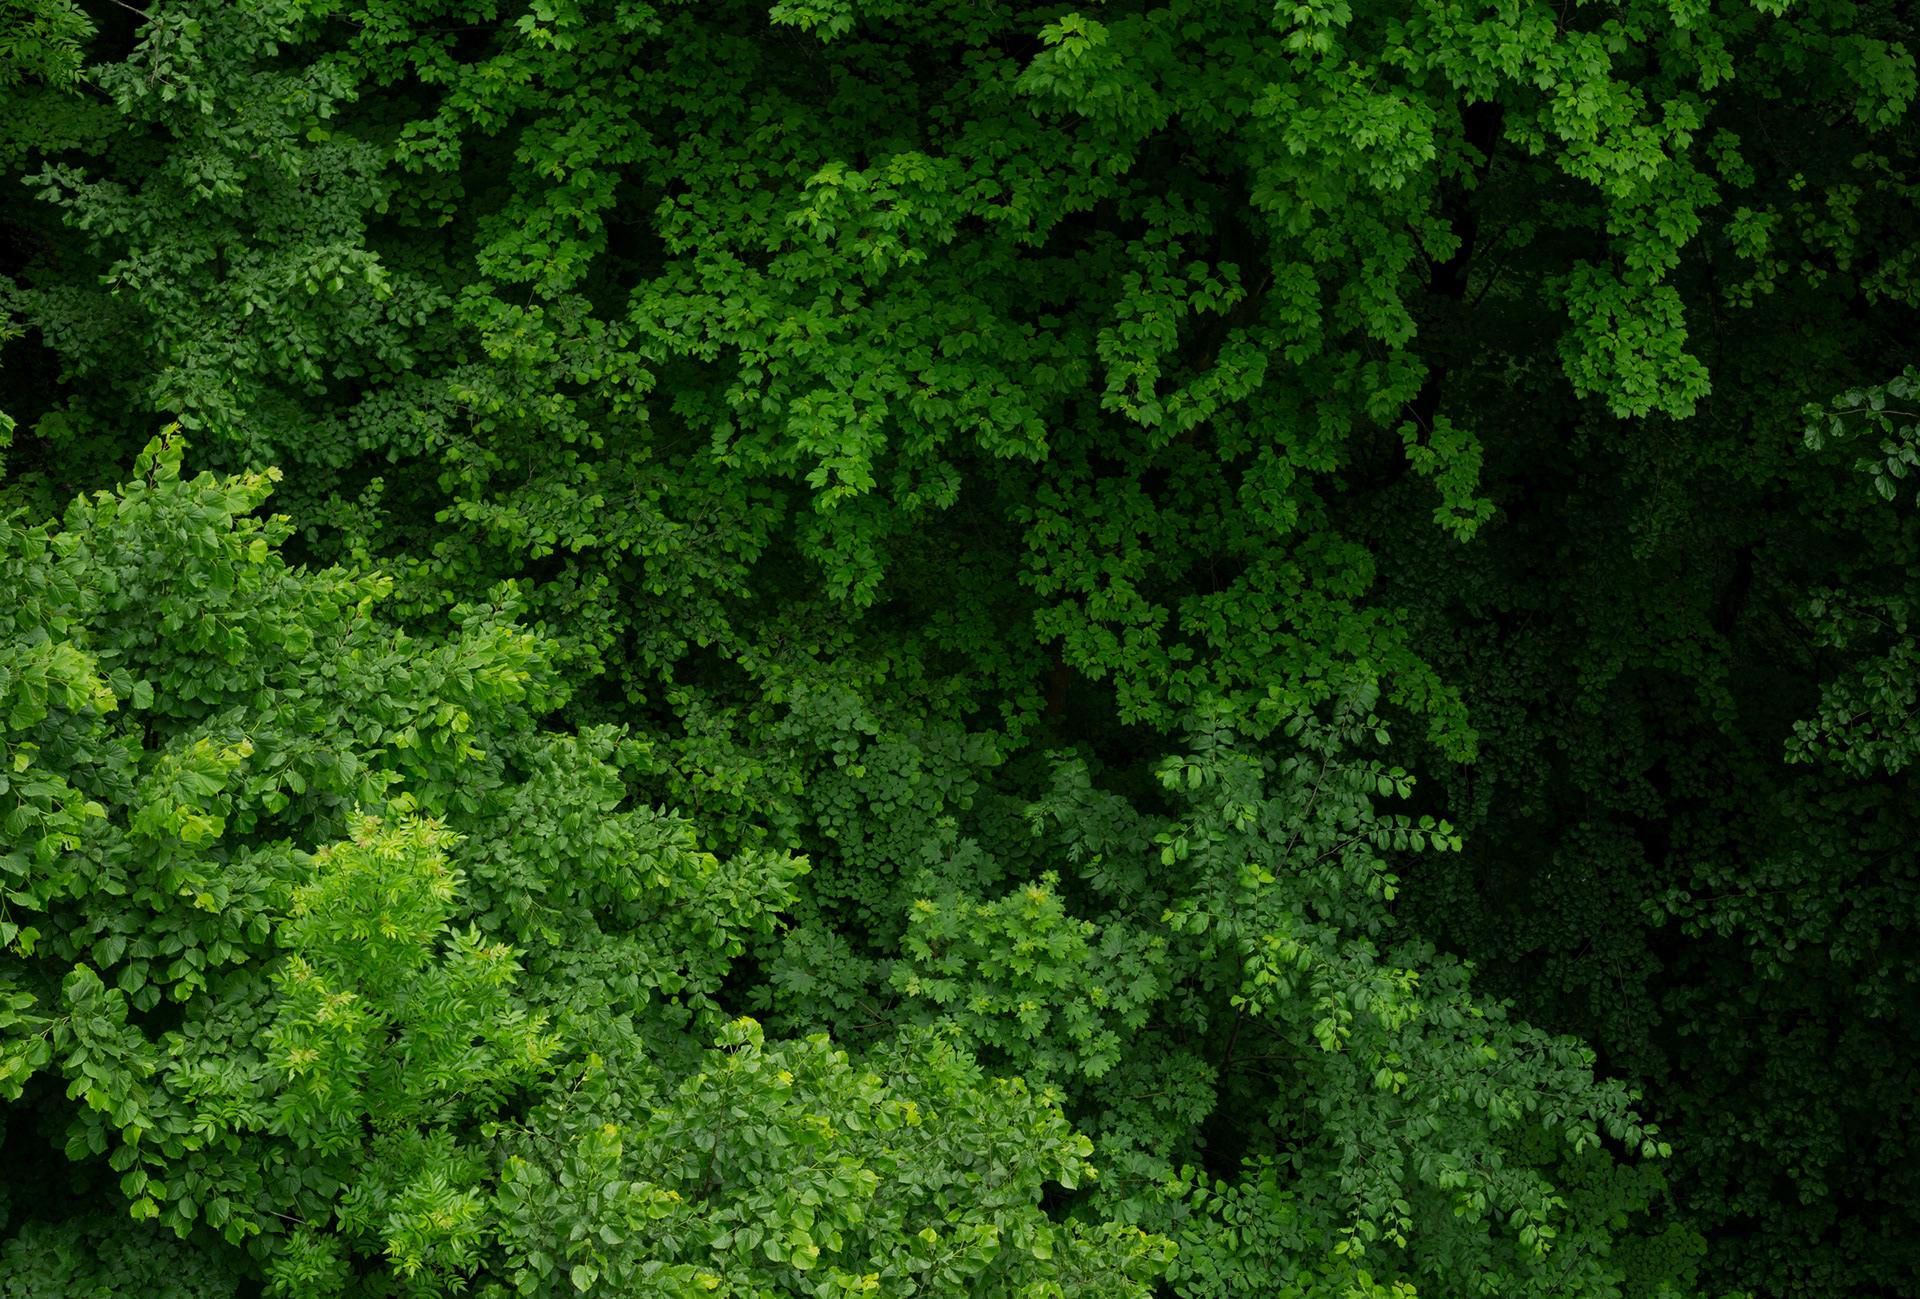 Trees and plants with green leaves, near Raška's stone, Kopřivnické hory, Czech Republic